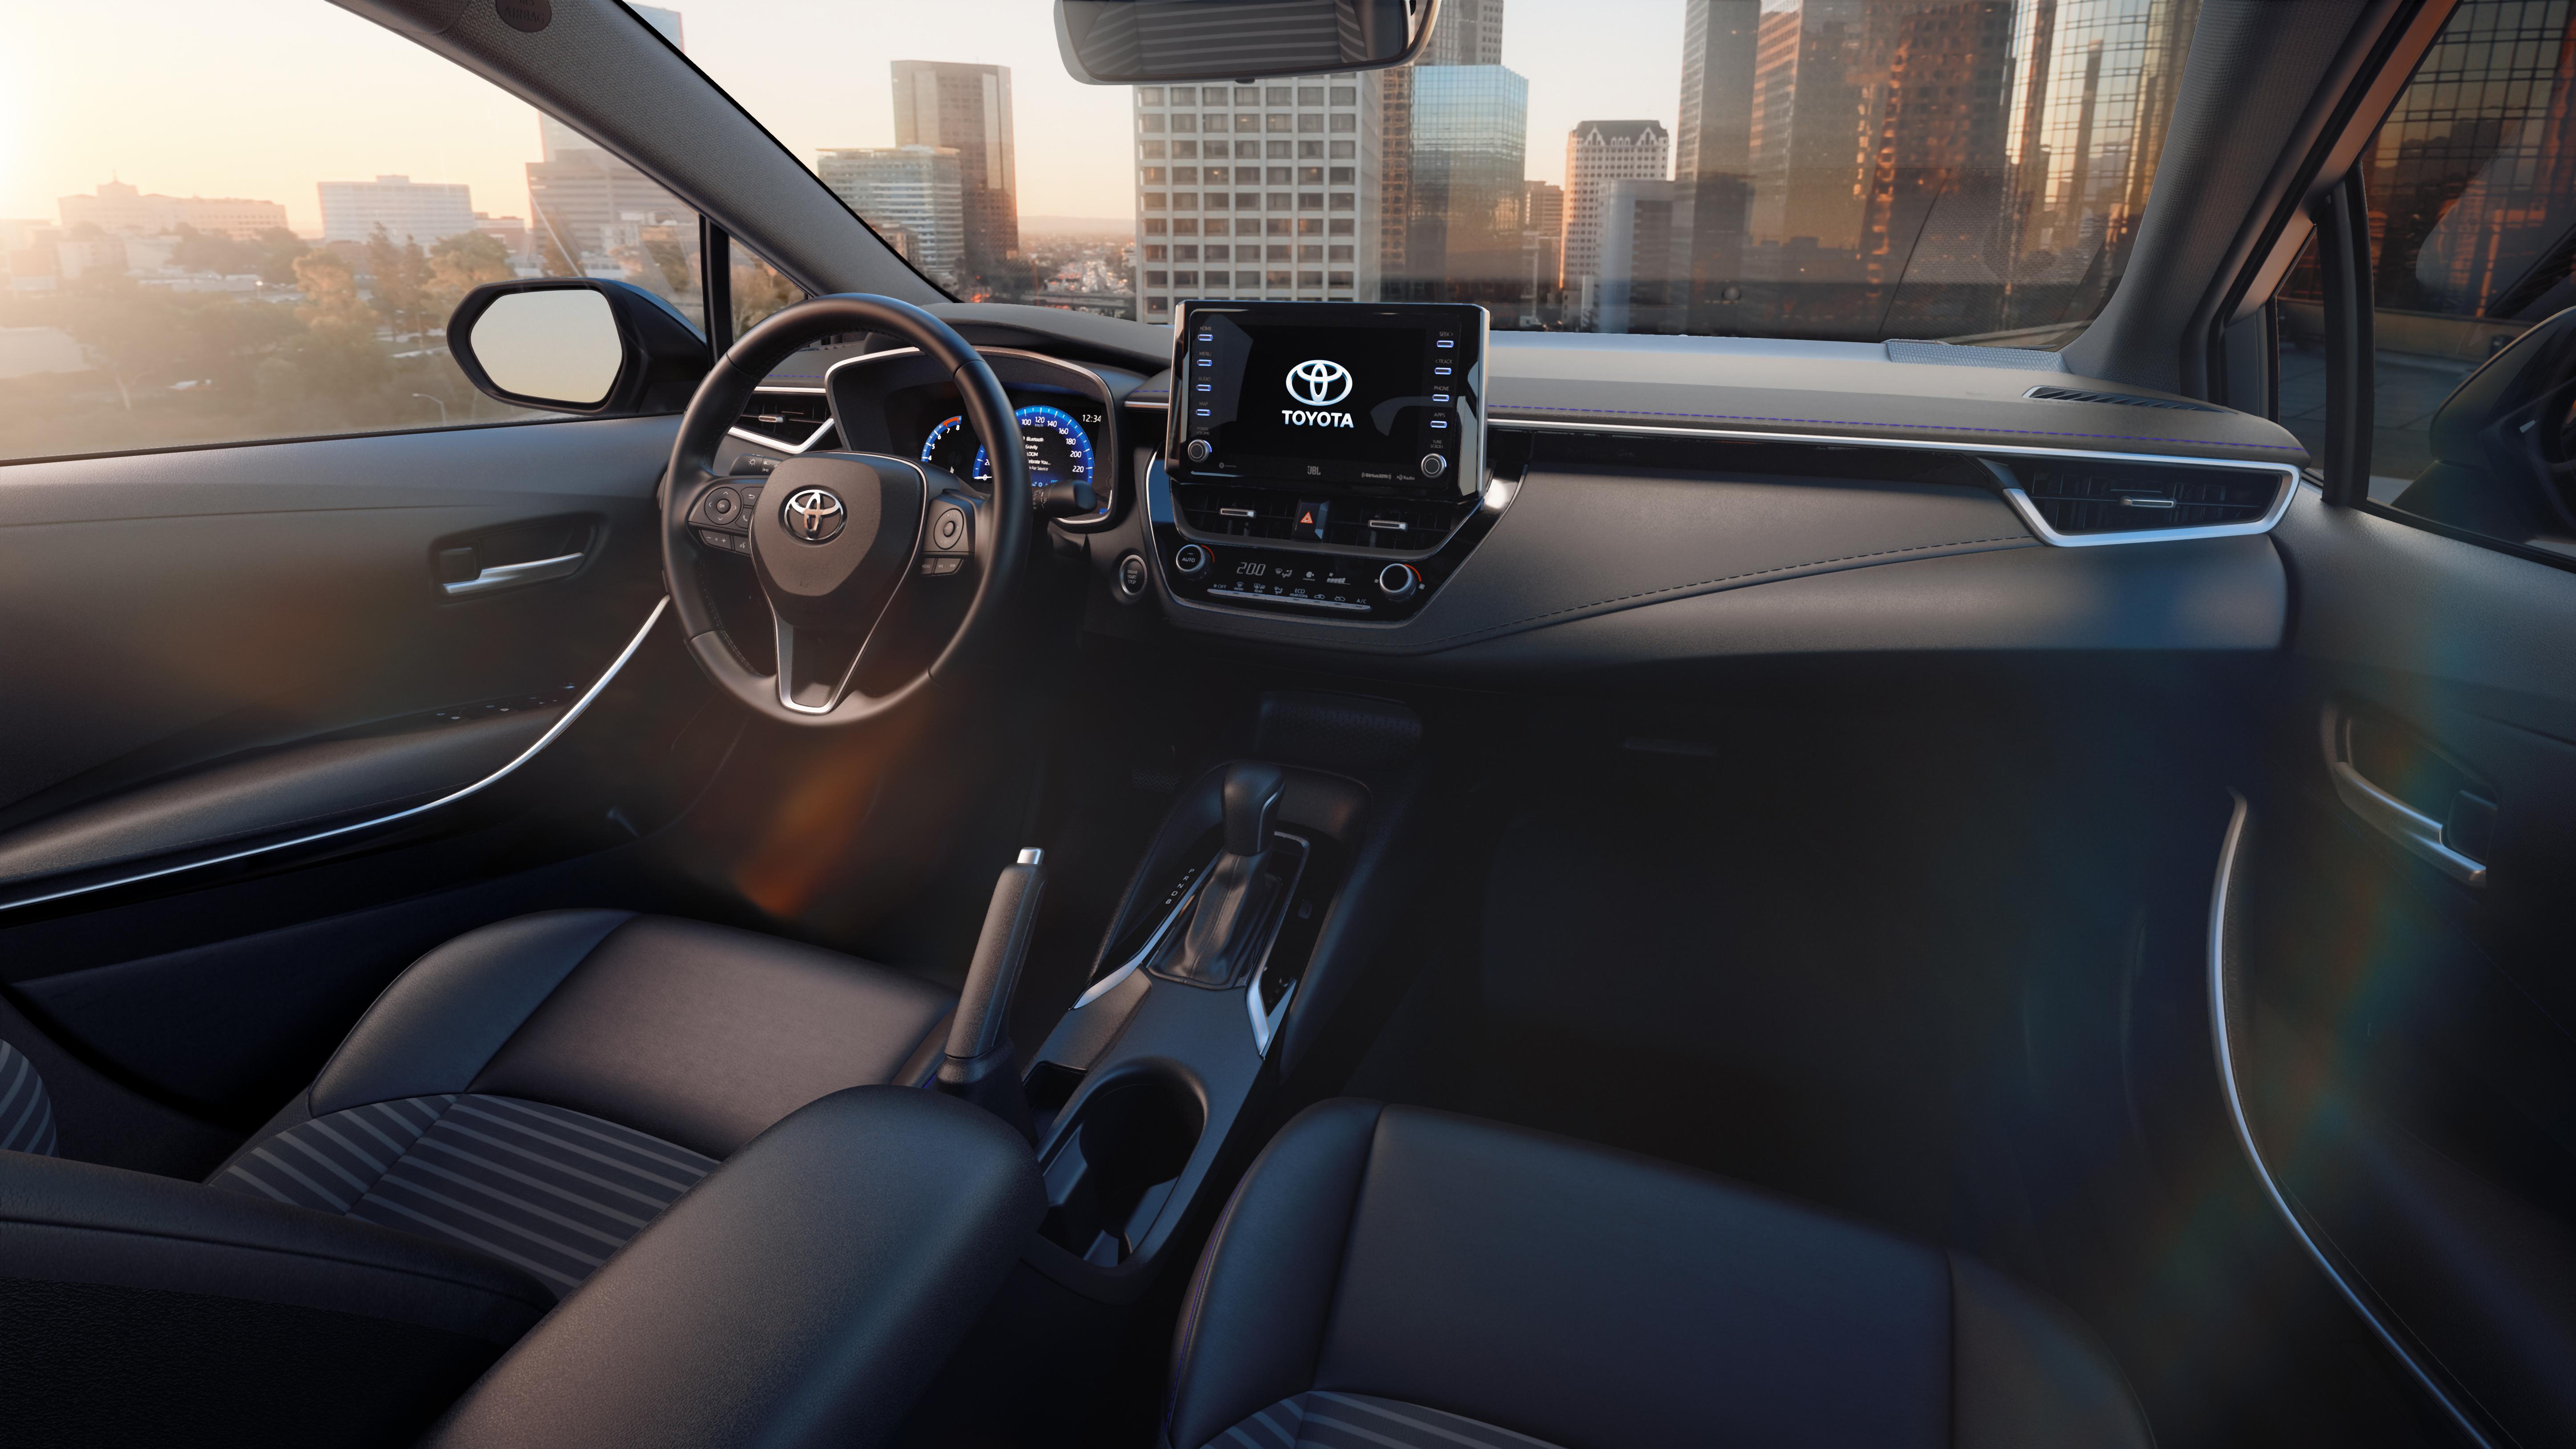 Kekurangan Toyota Corolla Sedan 2019 Review